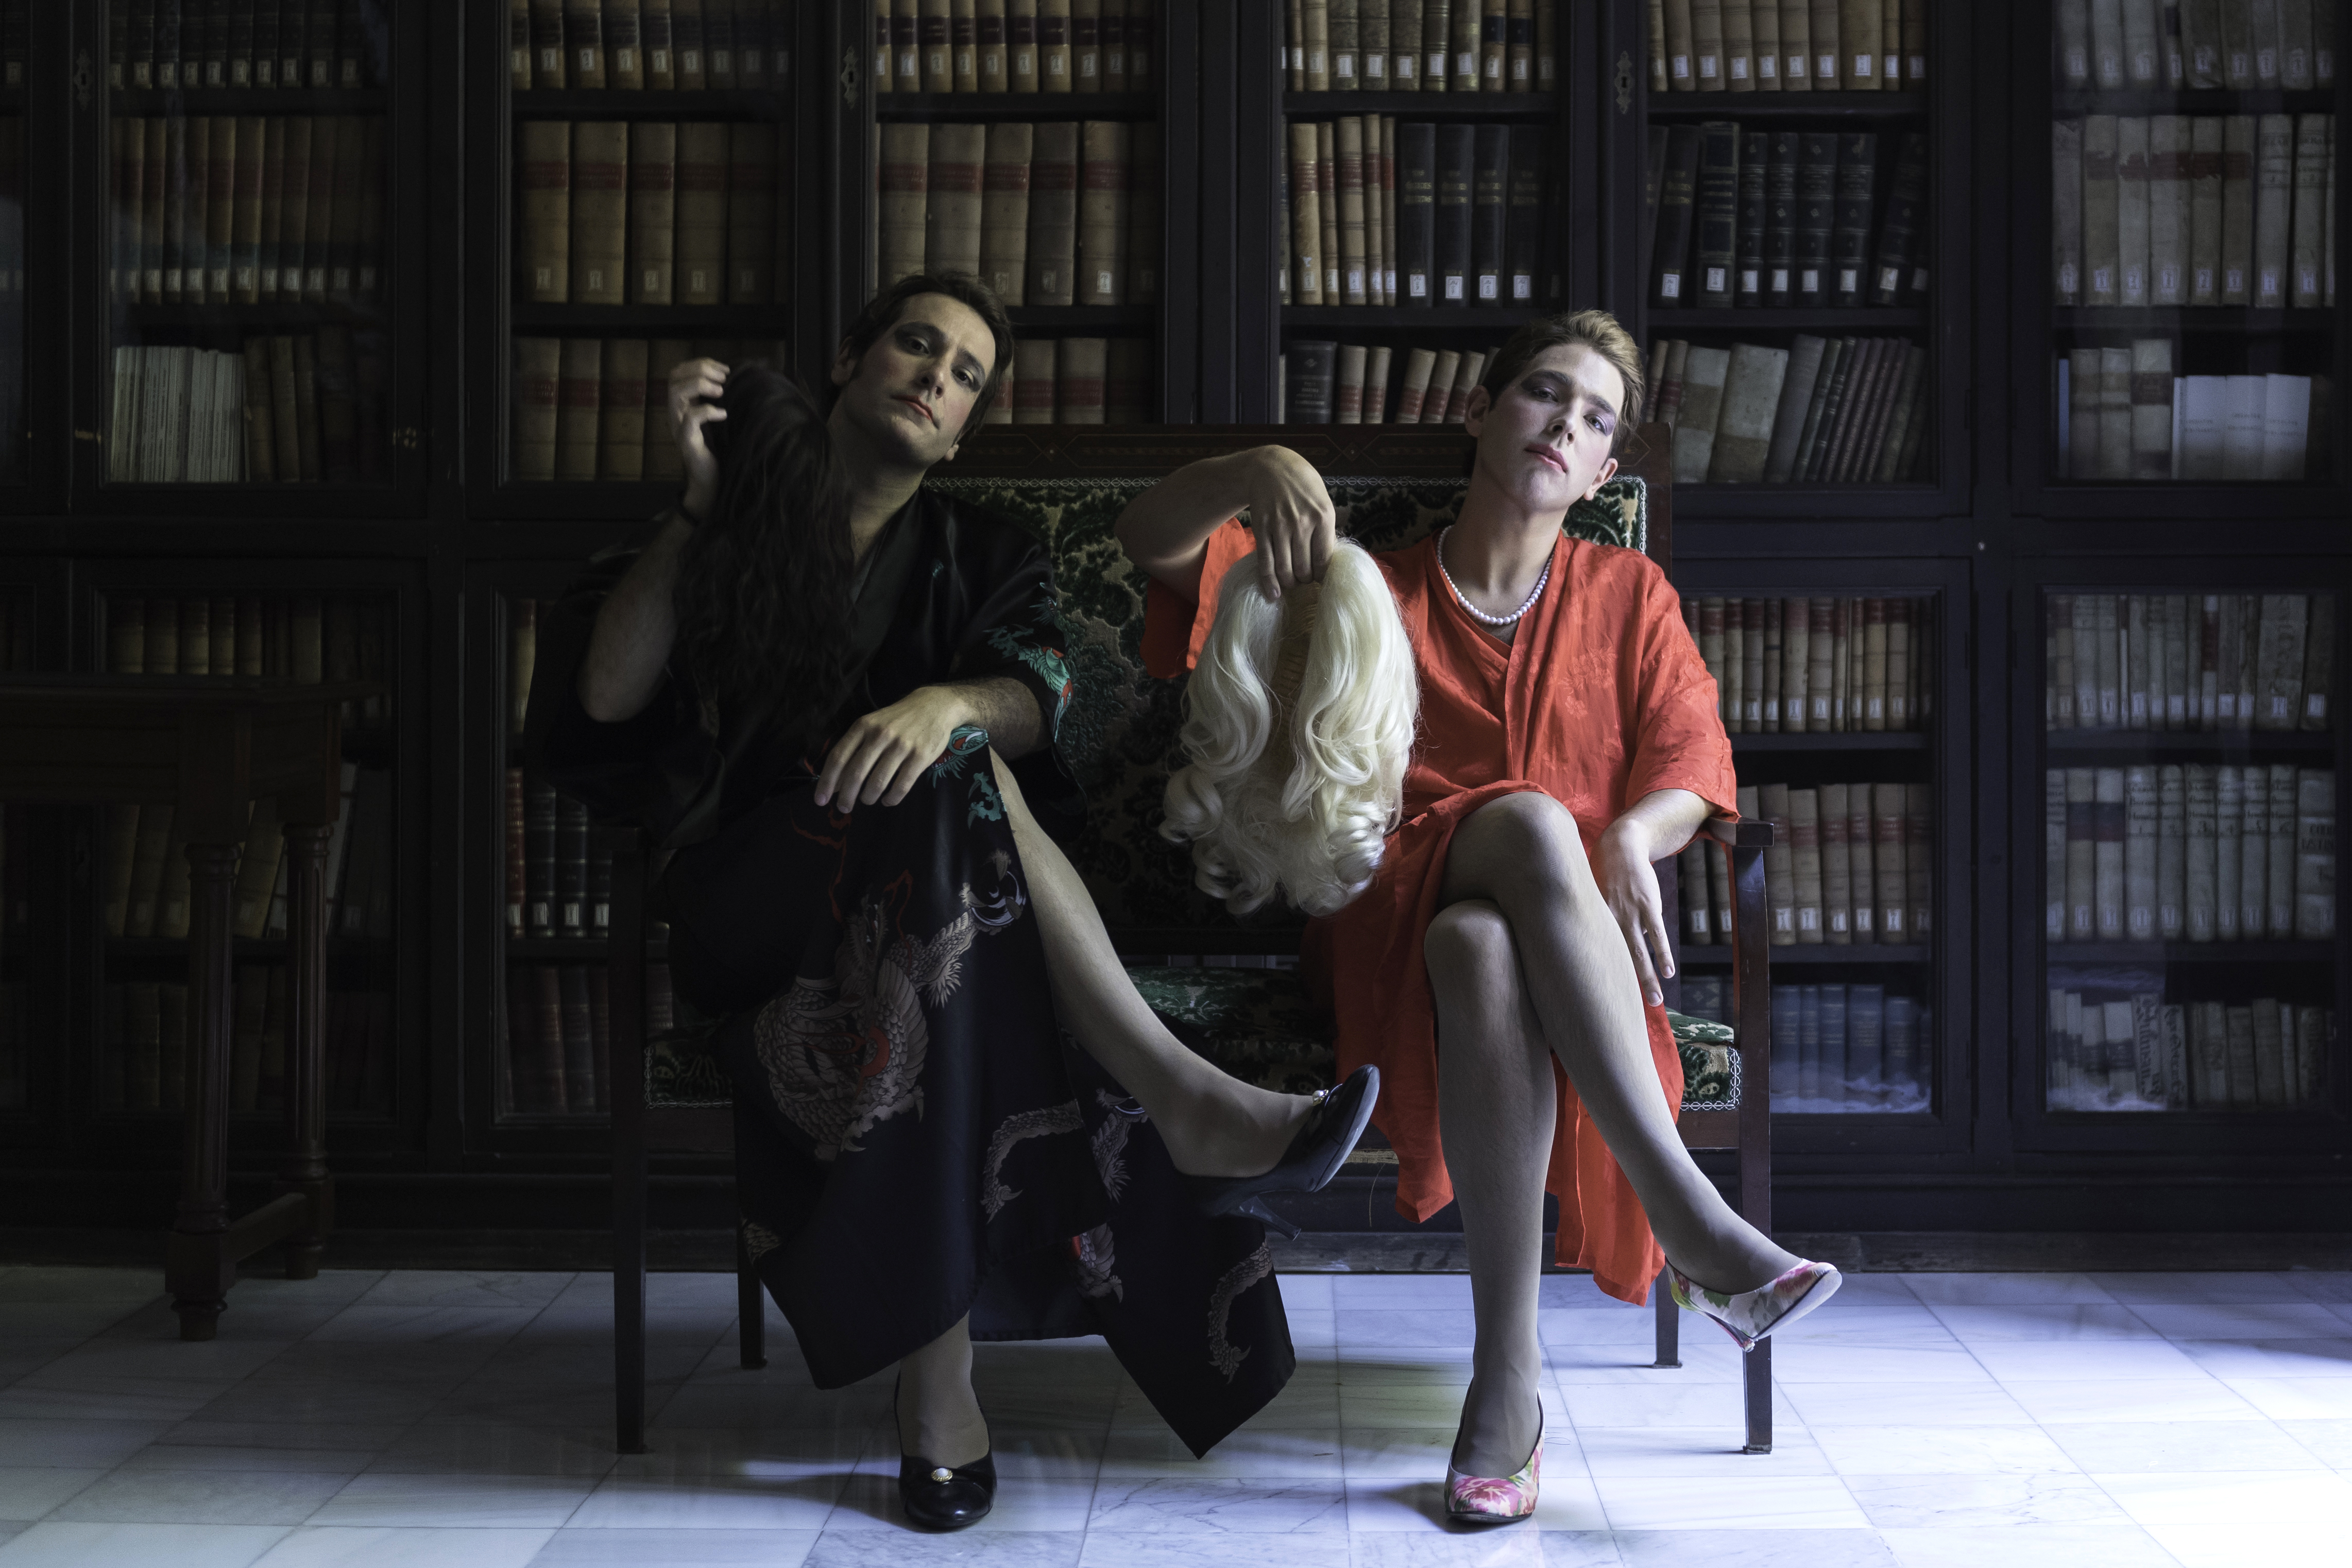 Les dones sàvies (┬® May Zircus)